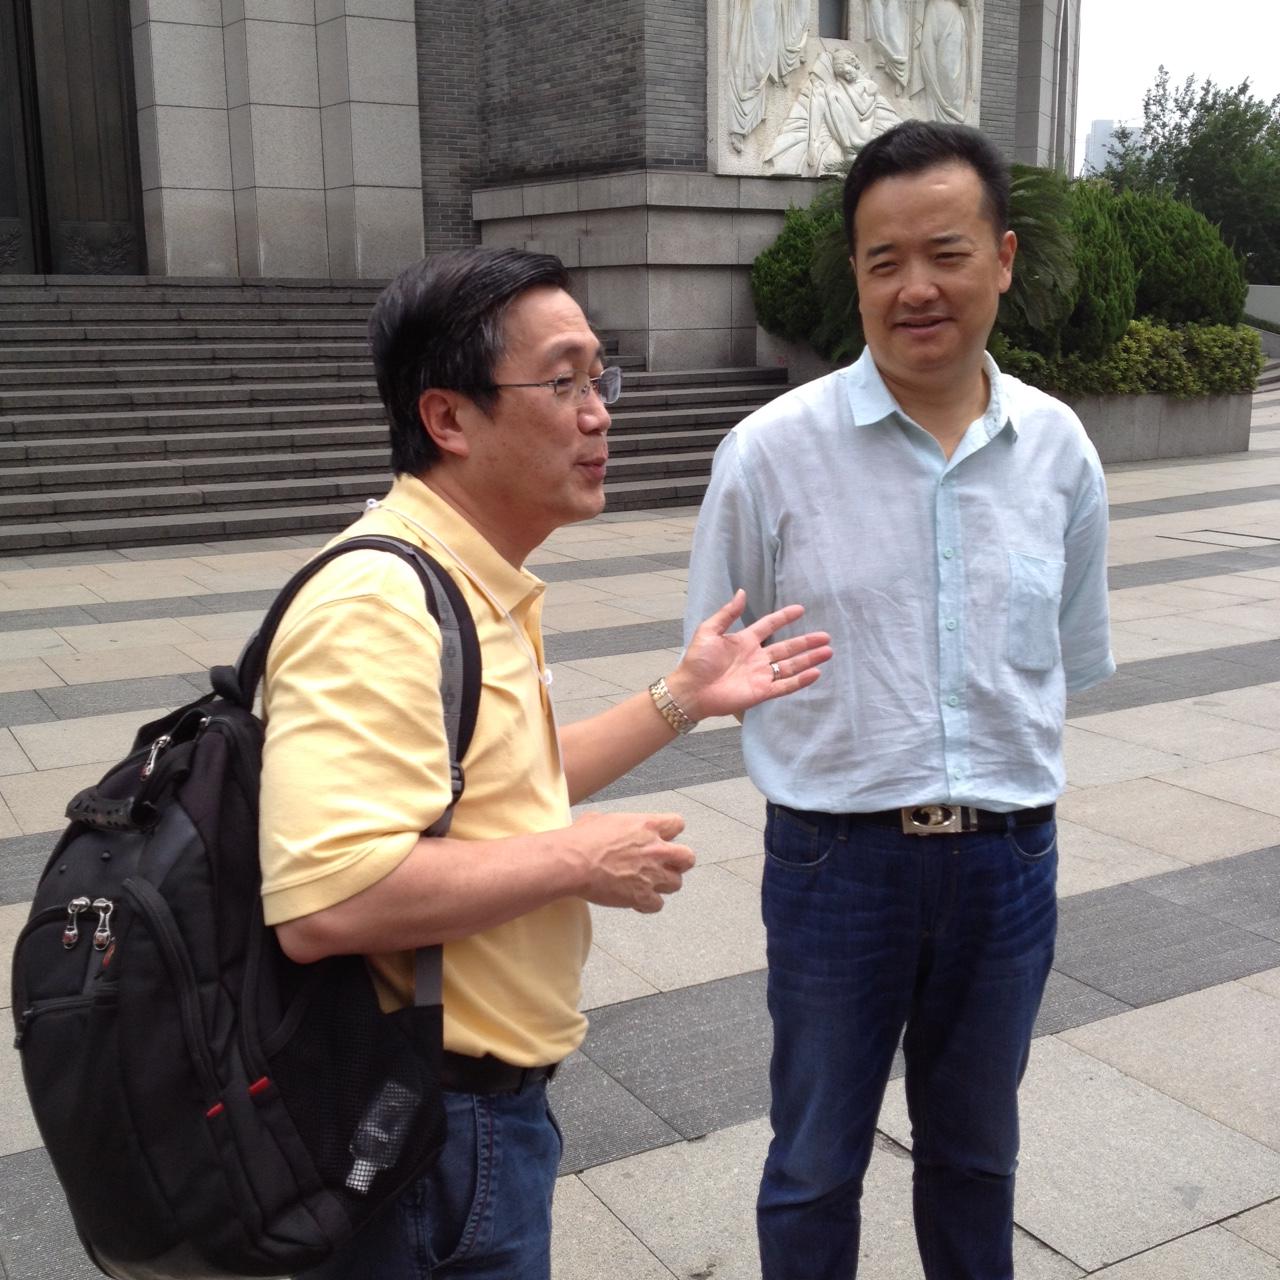 Dr. Peter Lim introduces his friend, Rev. Joseph Gu, senior pastor at the Chongyi Church